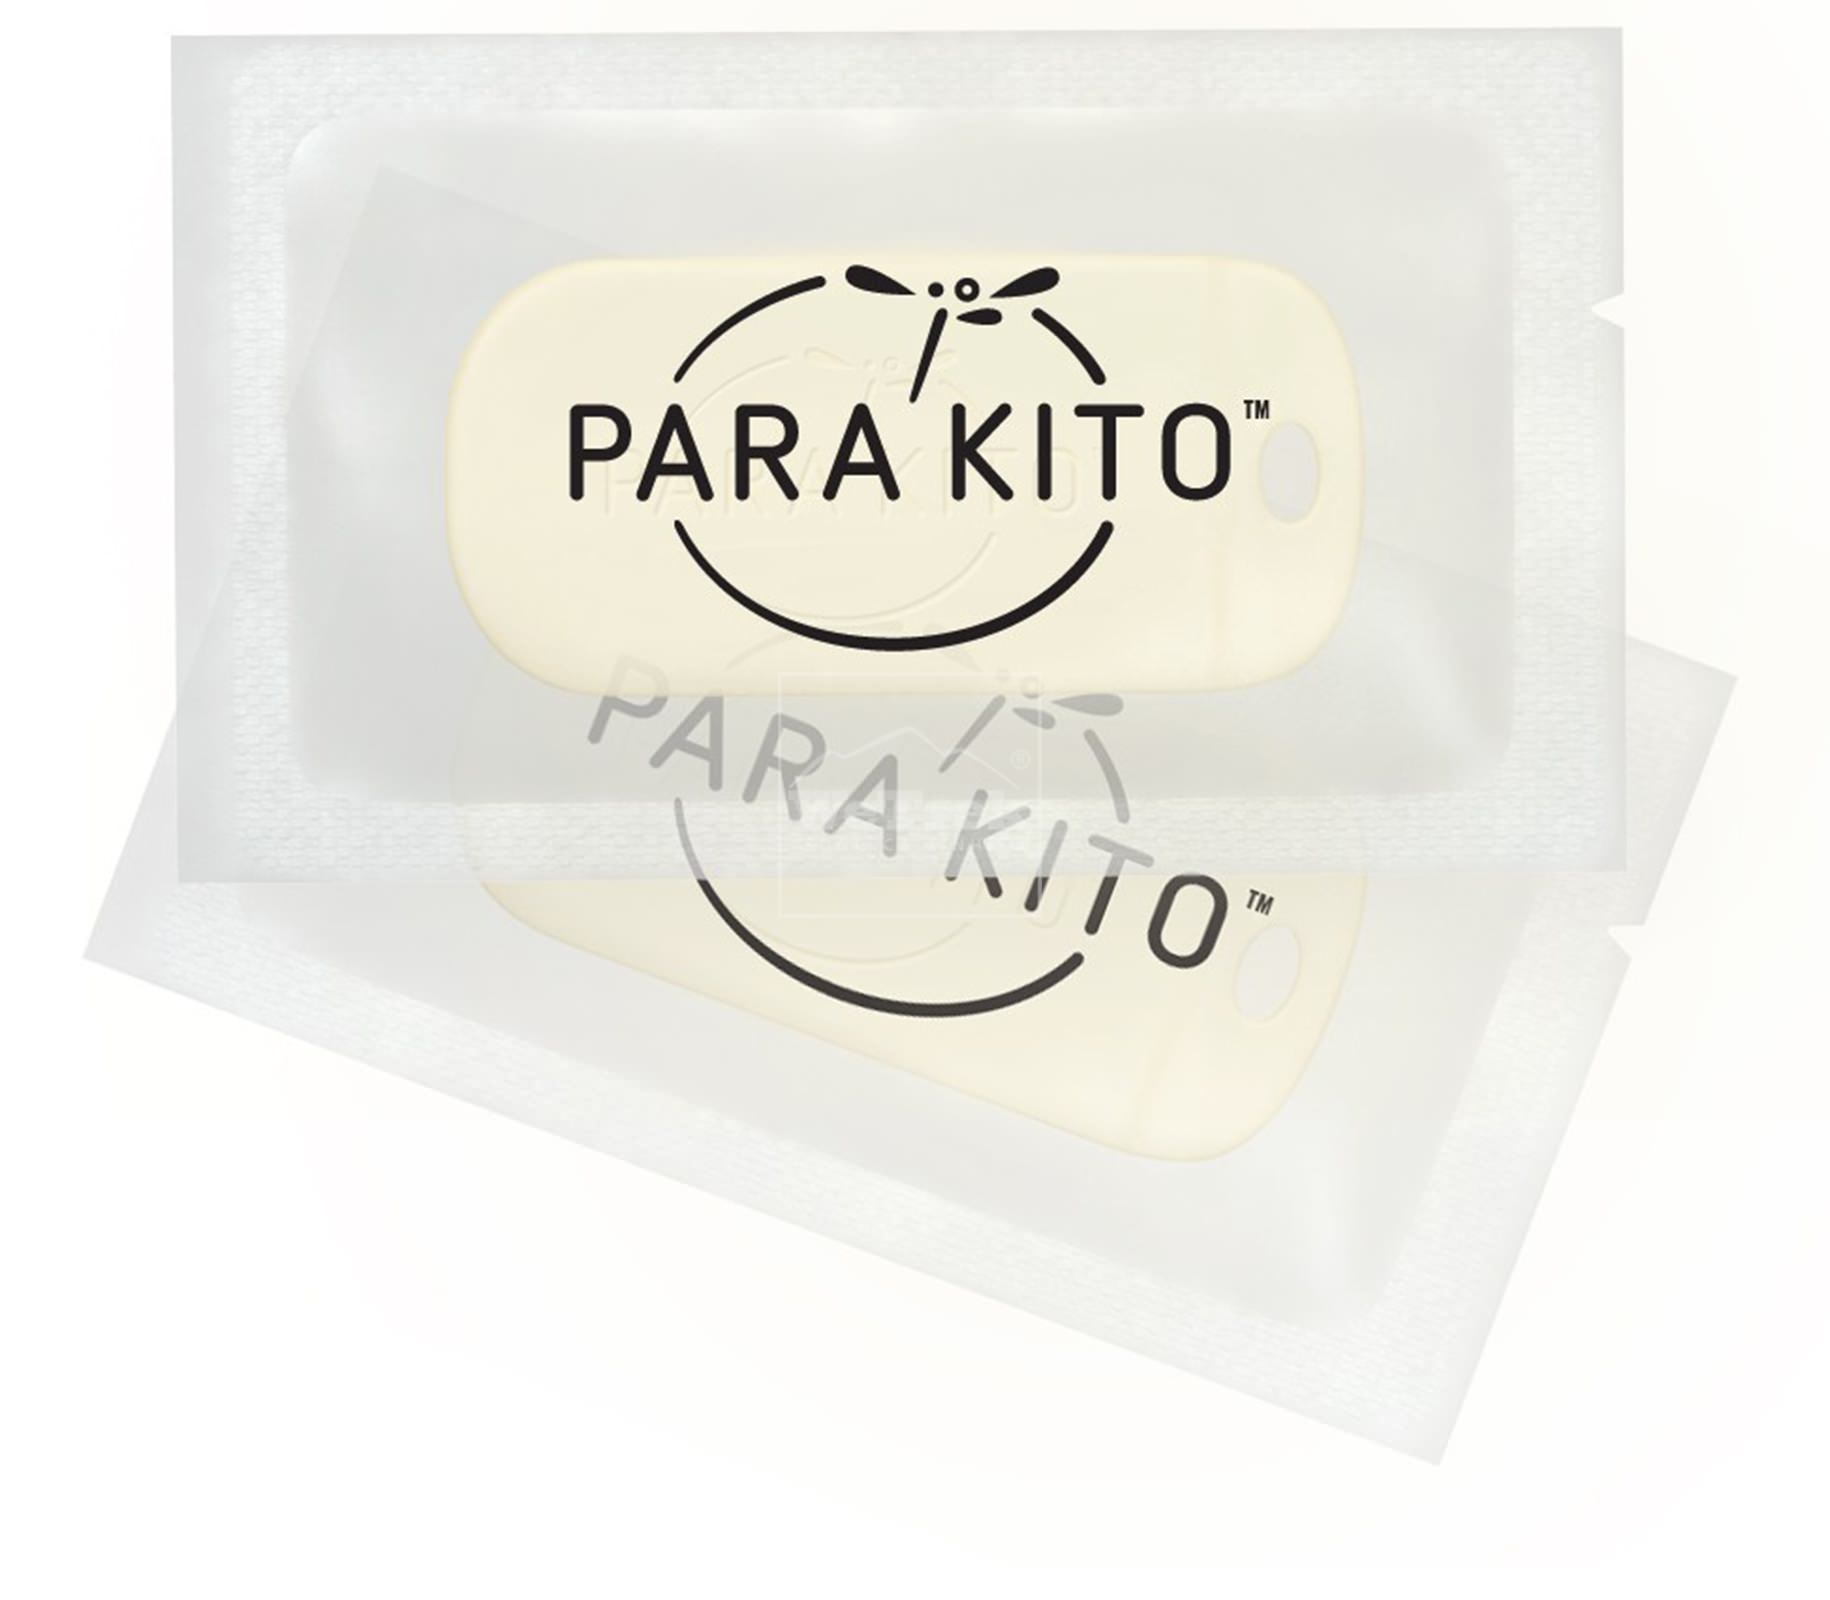 sap-chong-muoi-kem-vong-tay-parakito-zebra-band-7496-wetrek.vn-3